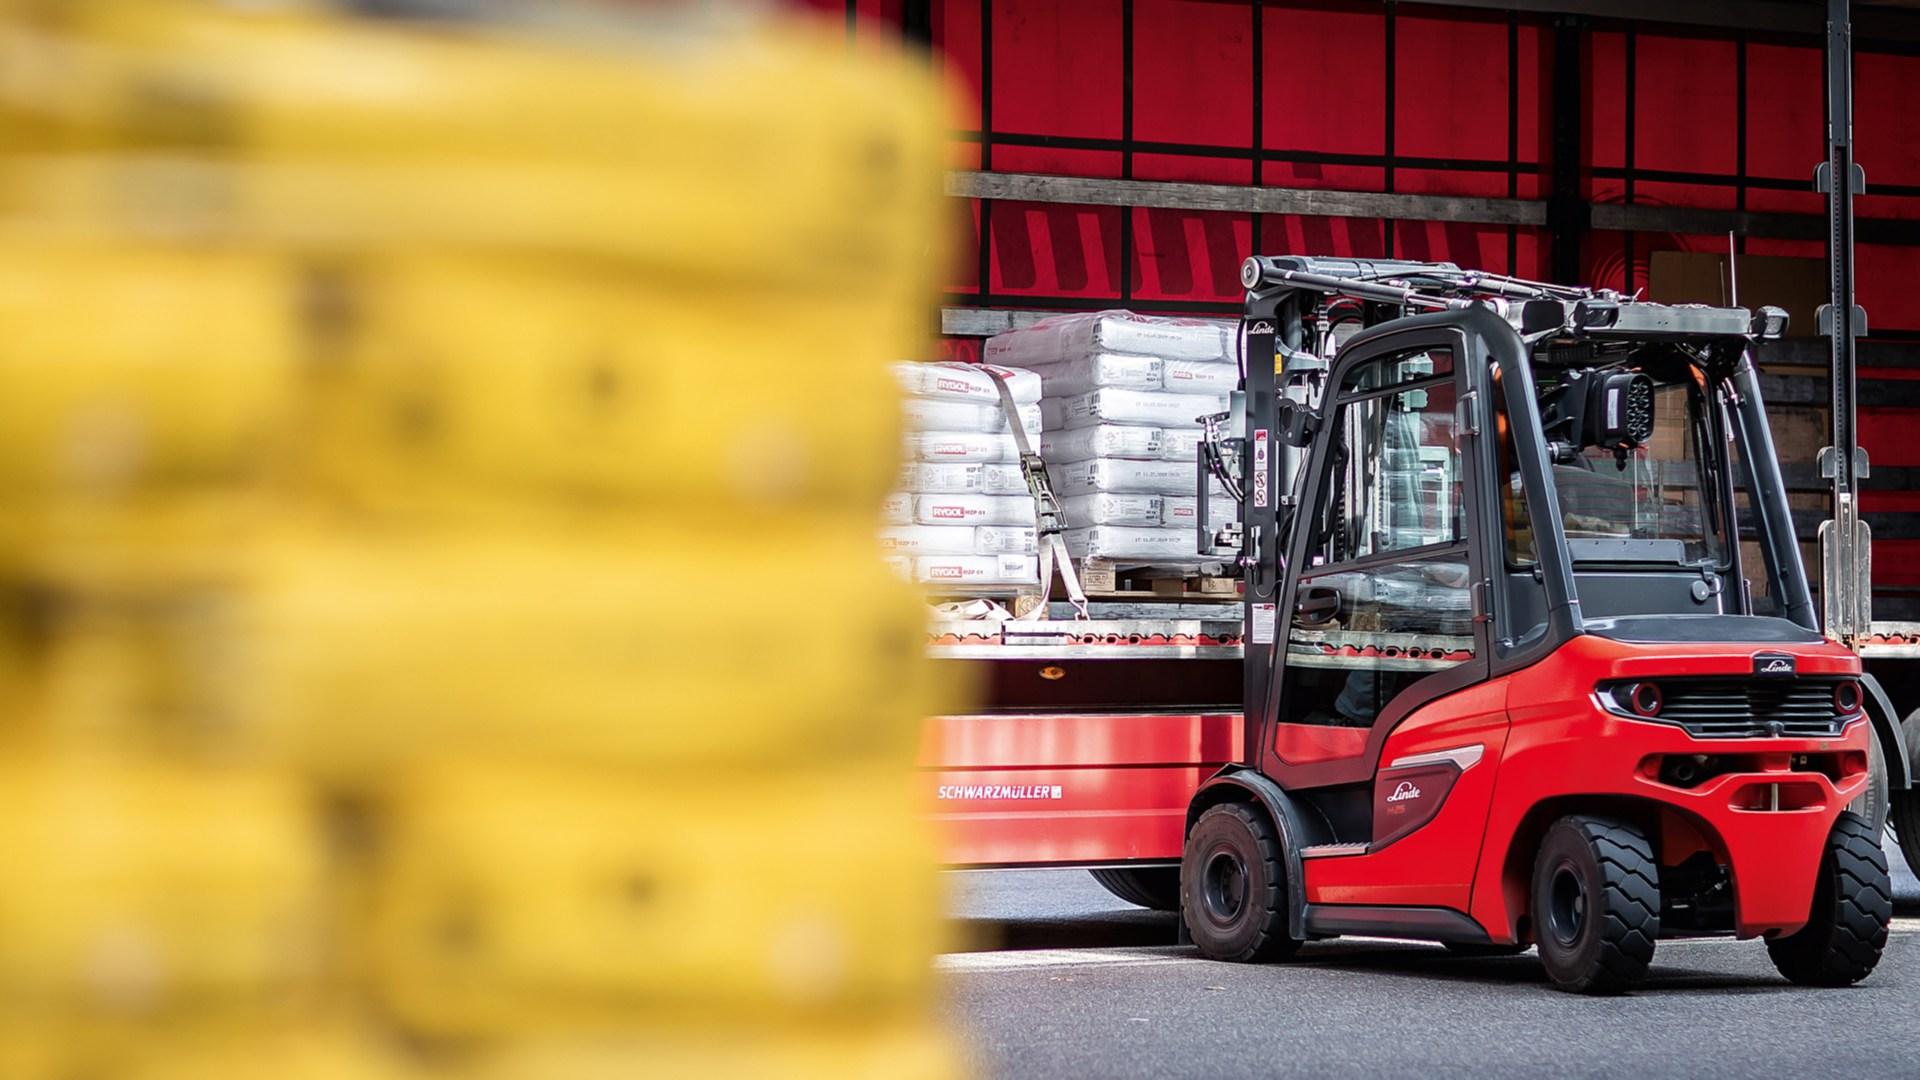 ic_truck-H20_H35-1202-H30-loading-041_16x9w1920